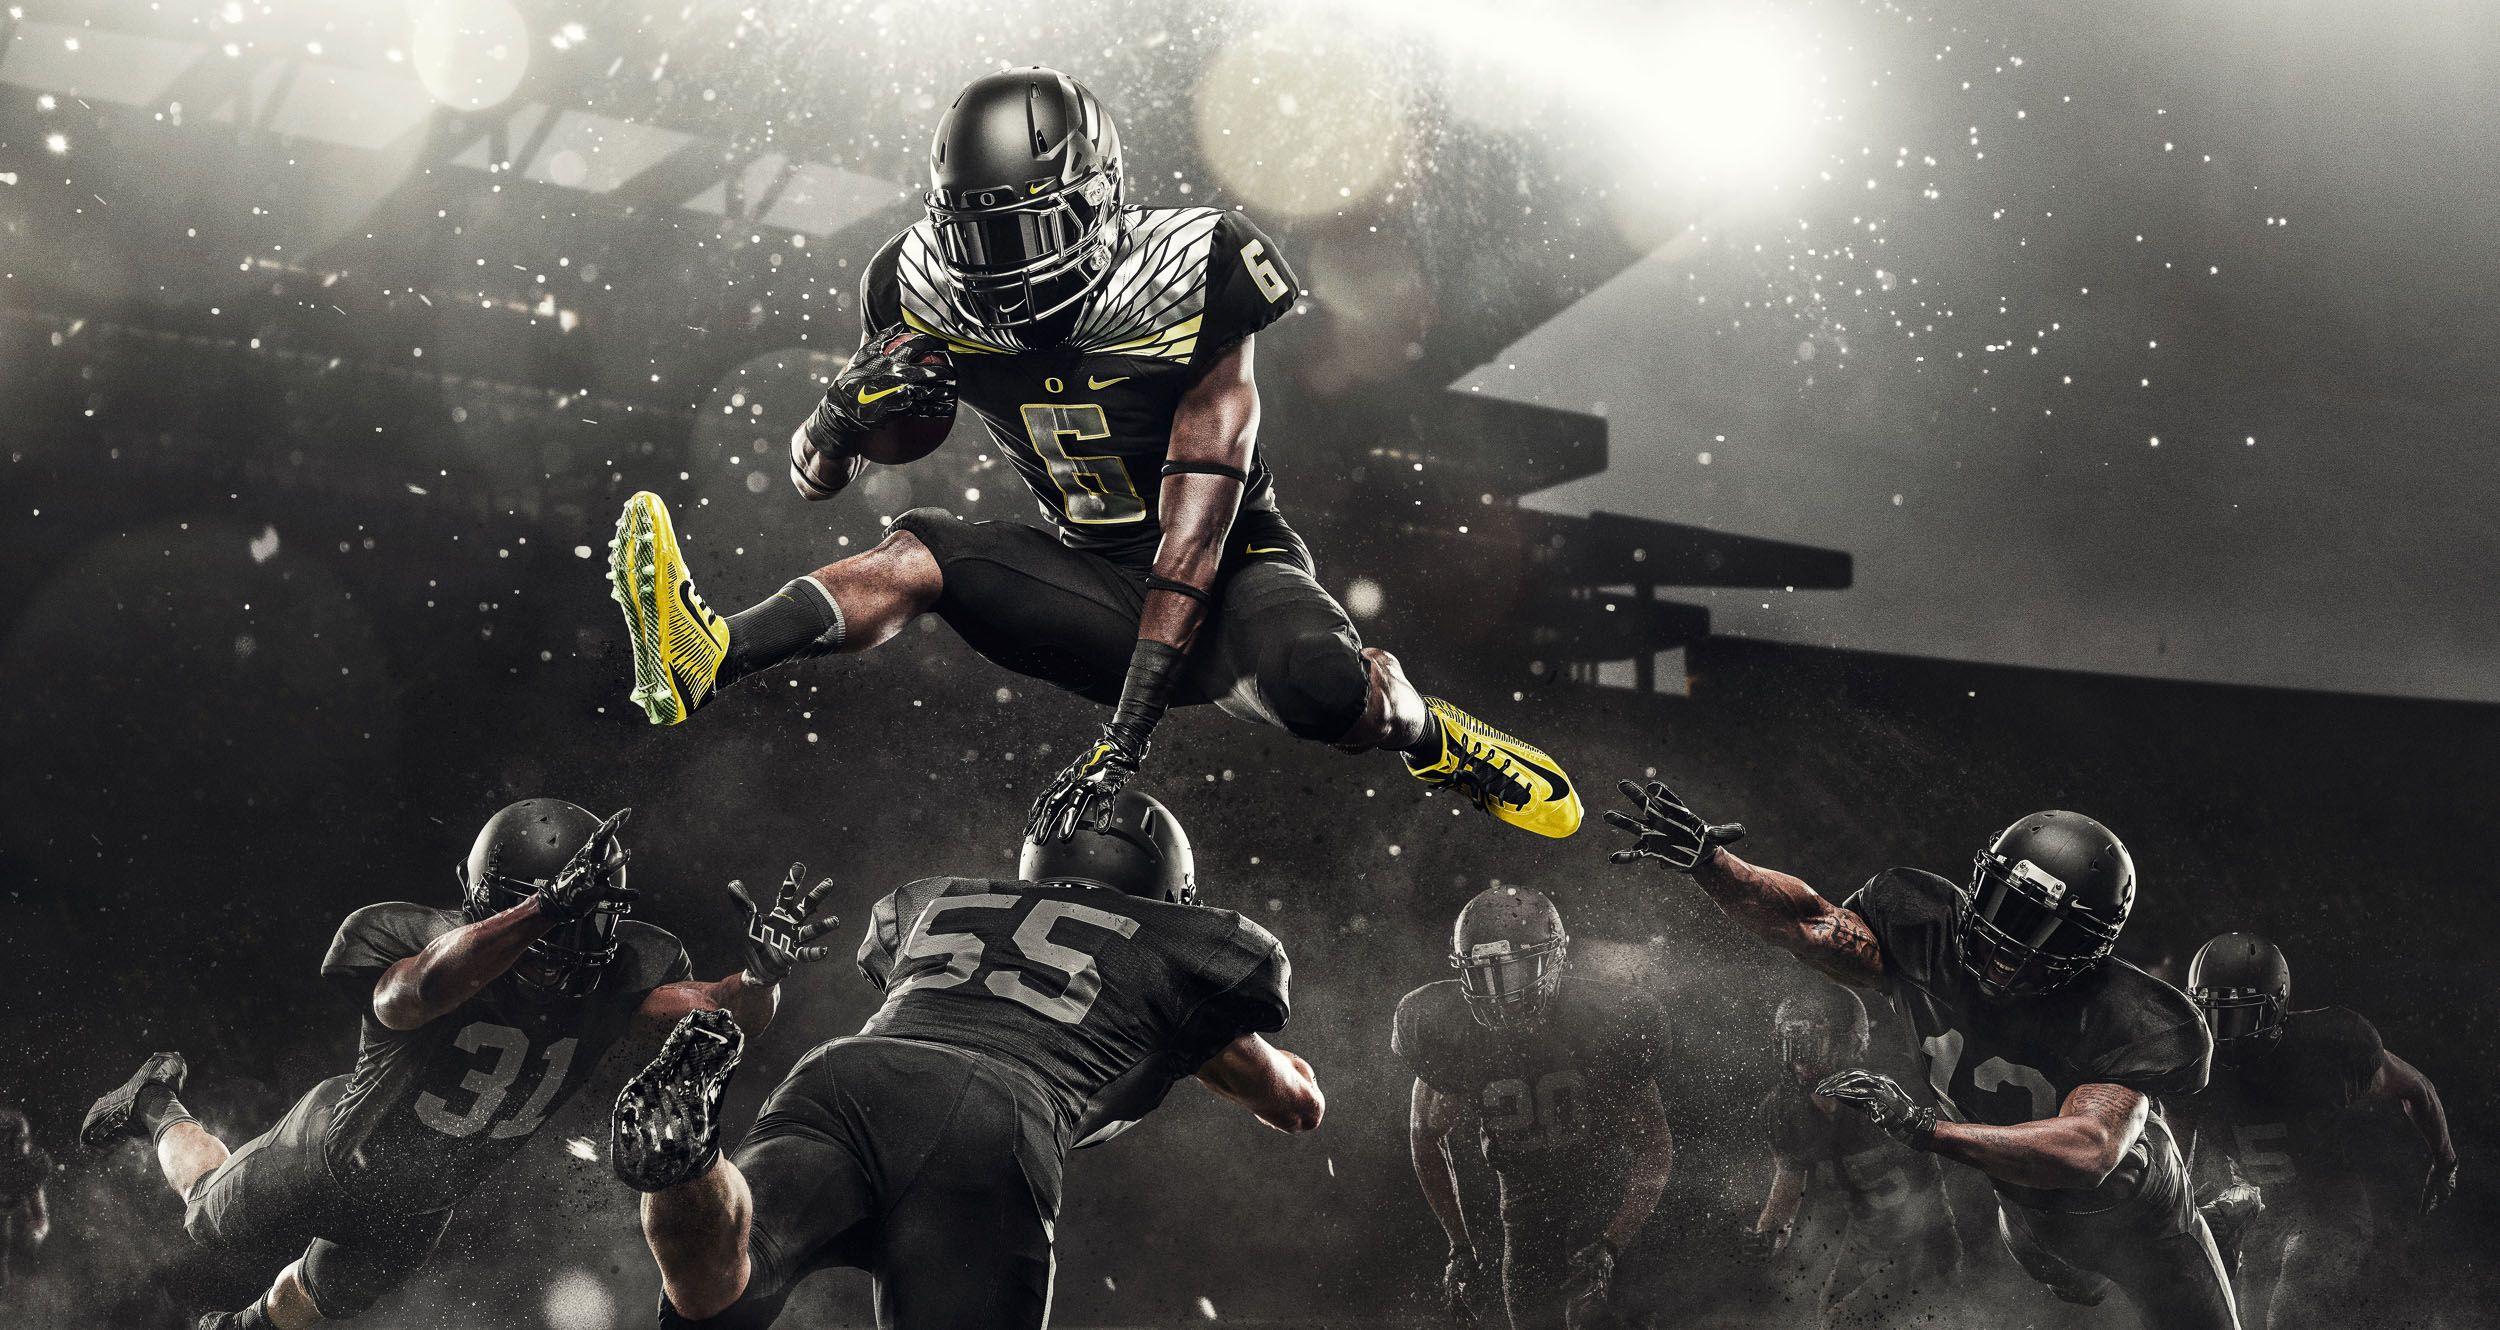 Nike Ncaa Ohio Oregon Ads Sport Photography Football Photography Action Sports Photography